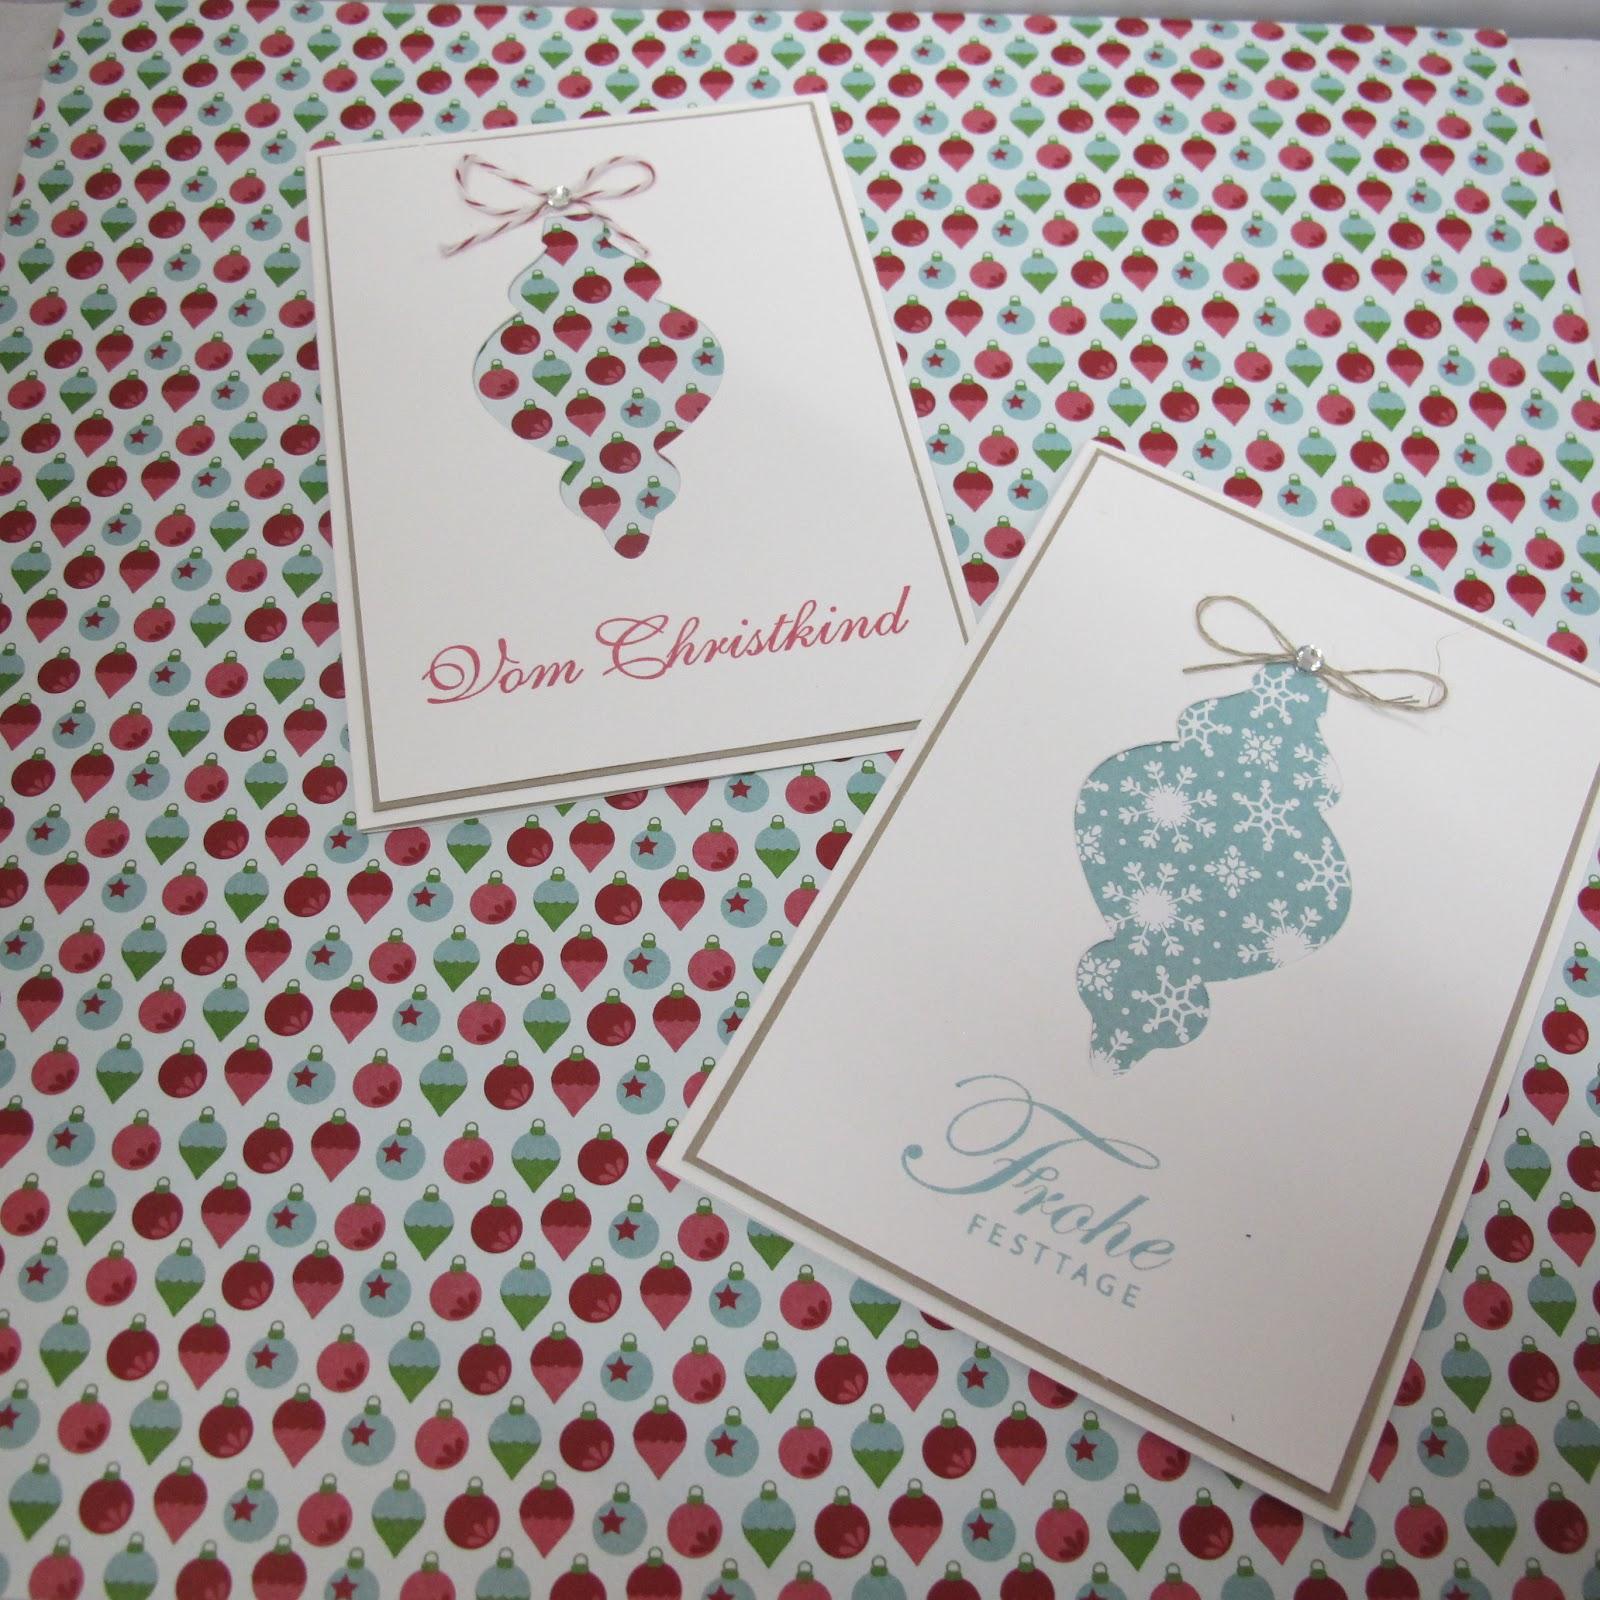 claudinchens kreative seite ornament karten. Black Bedroom Furniture Sets. Home Design Ideas